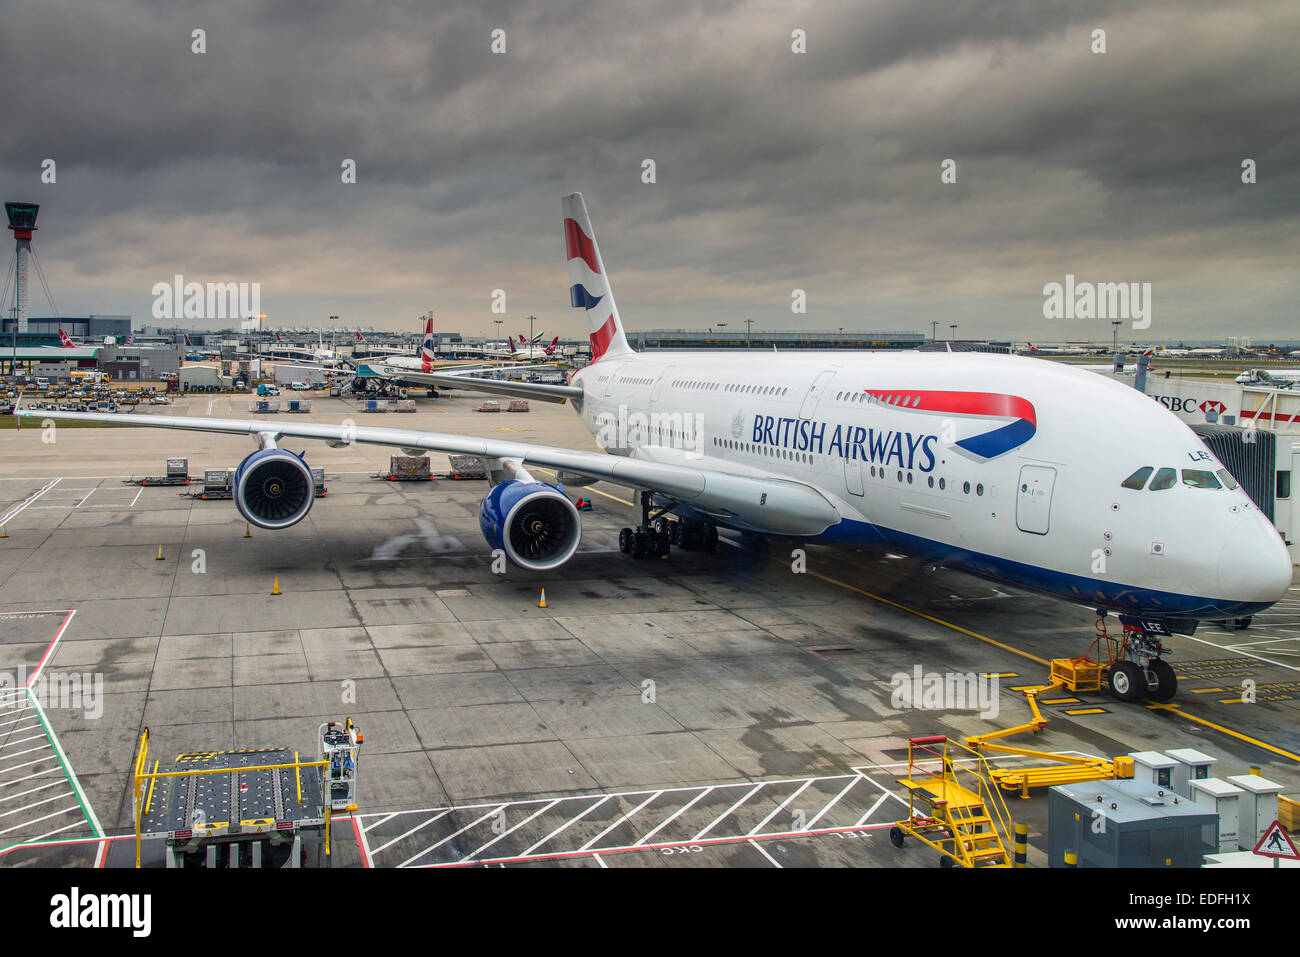 British Airways Airbus A380 at Terminal 5, Heathrow international airport, London, United Kingdom - Stock Image